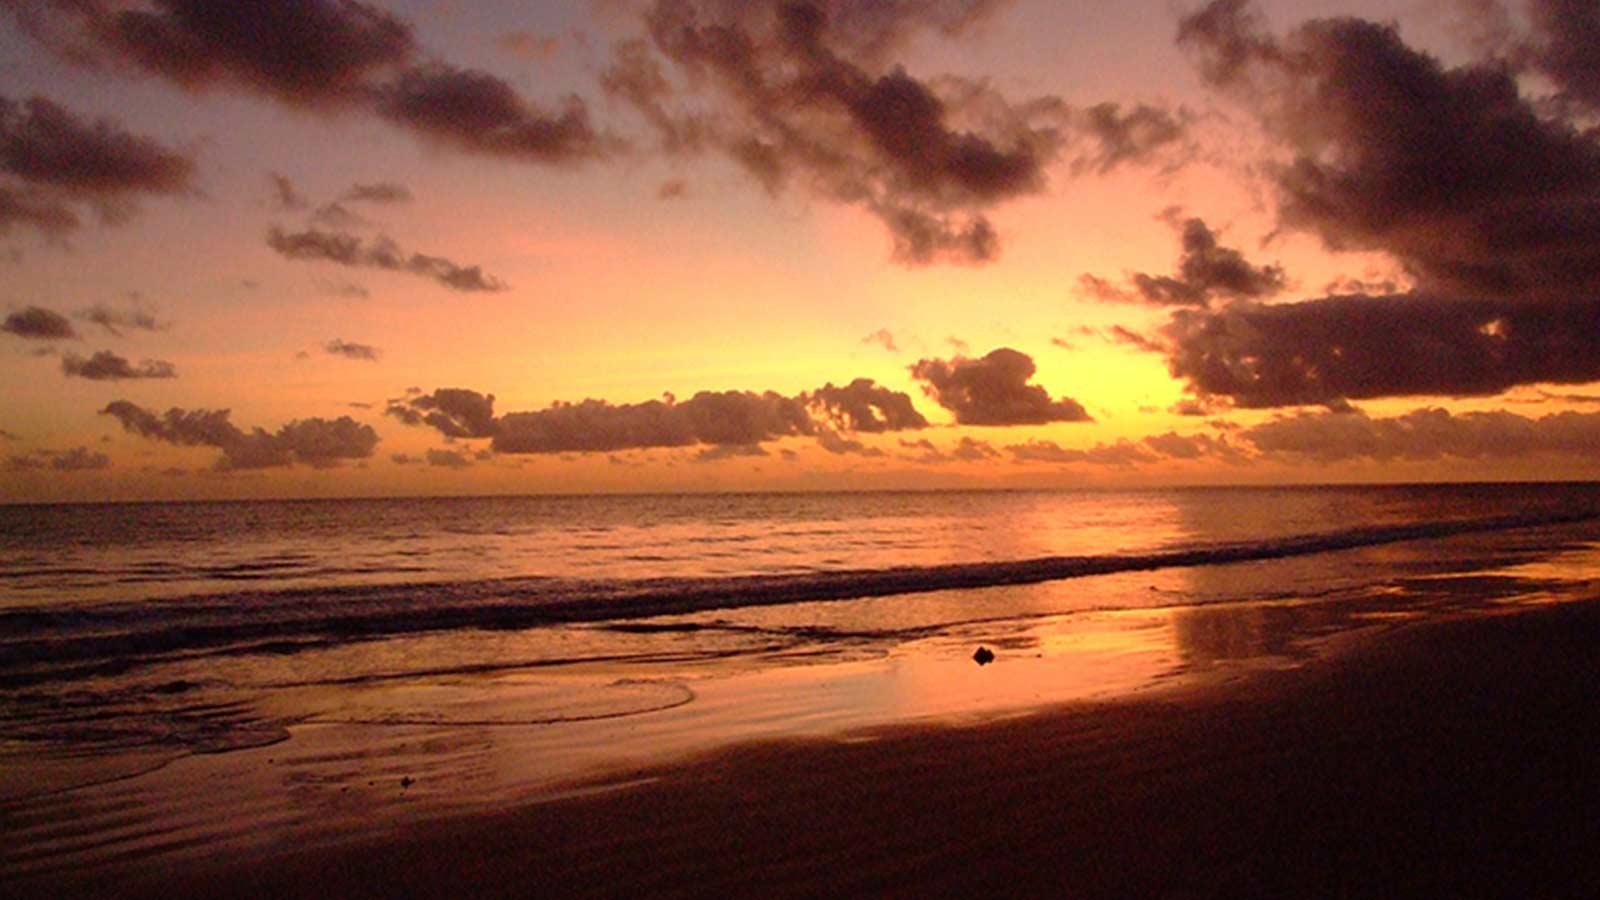 Sunset at Cape Tribulation